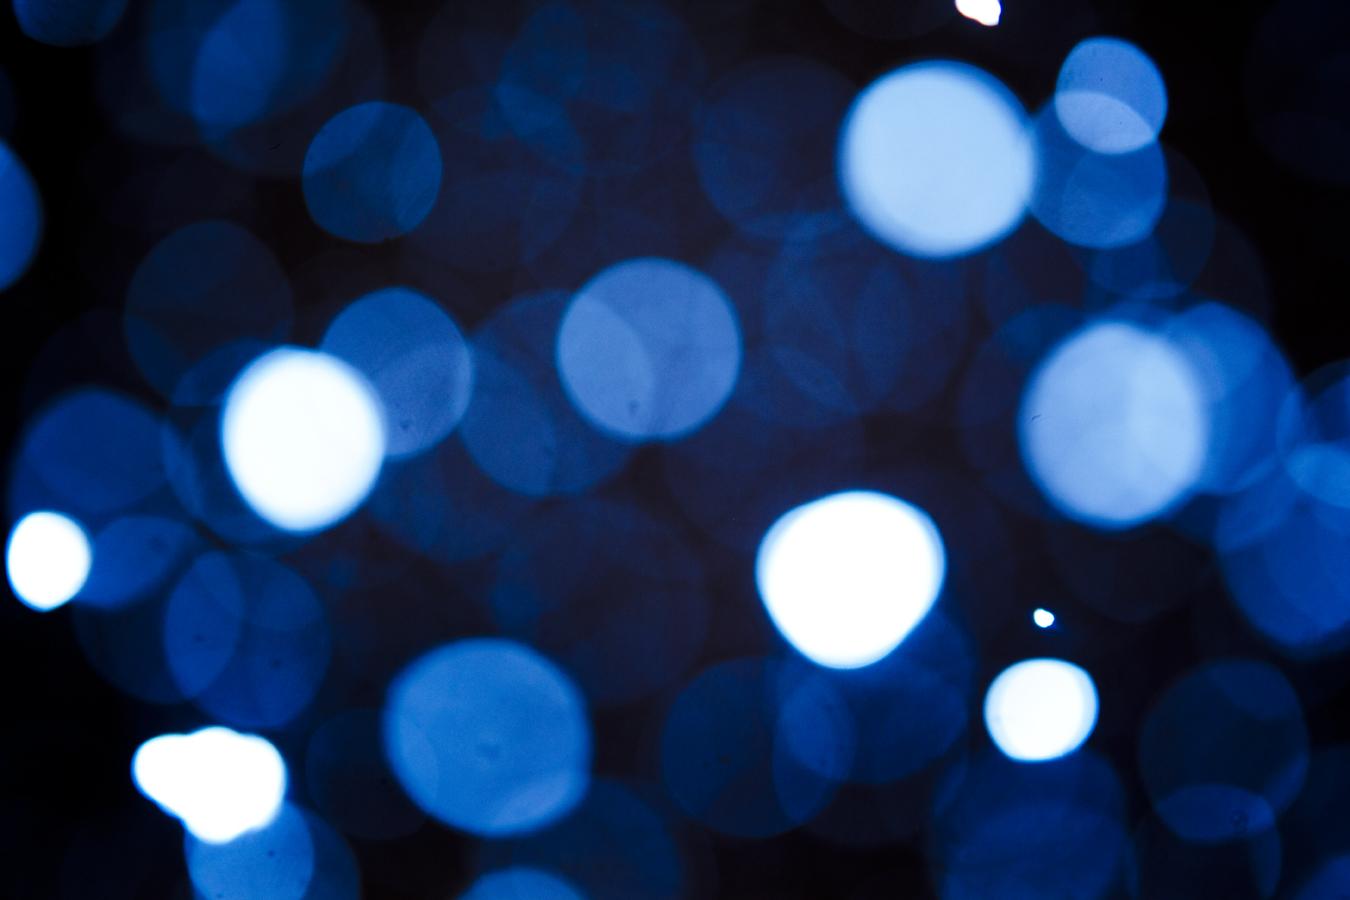 Snowflakes_SilvanoZeiter_2.jpg